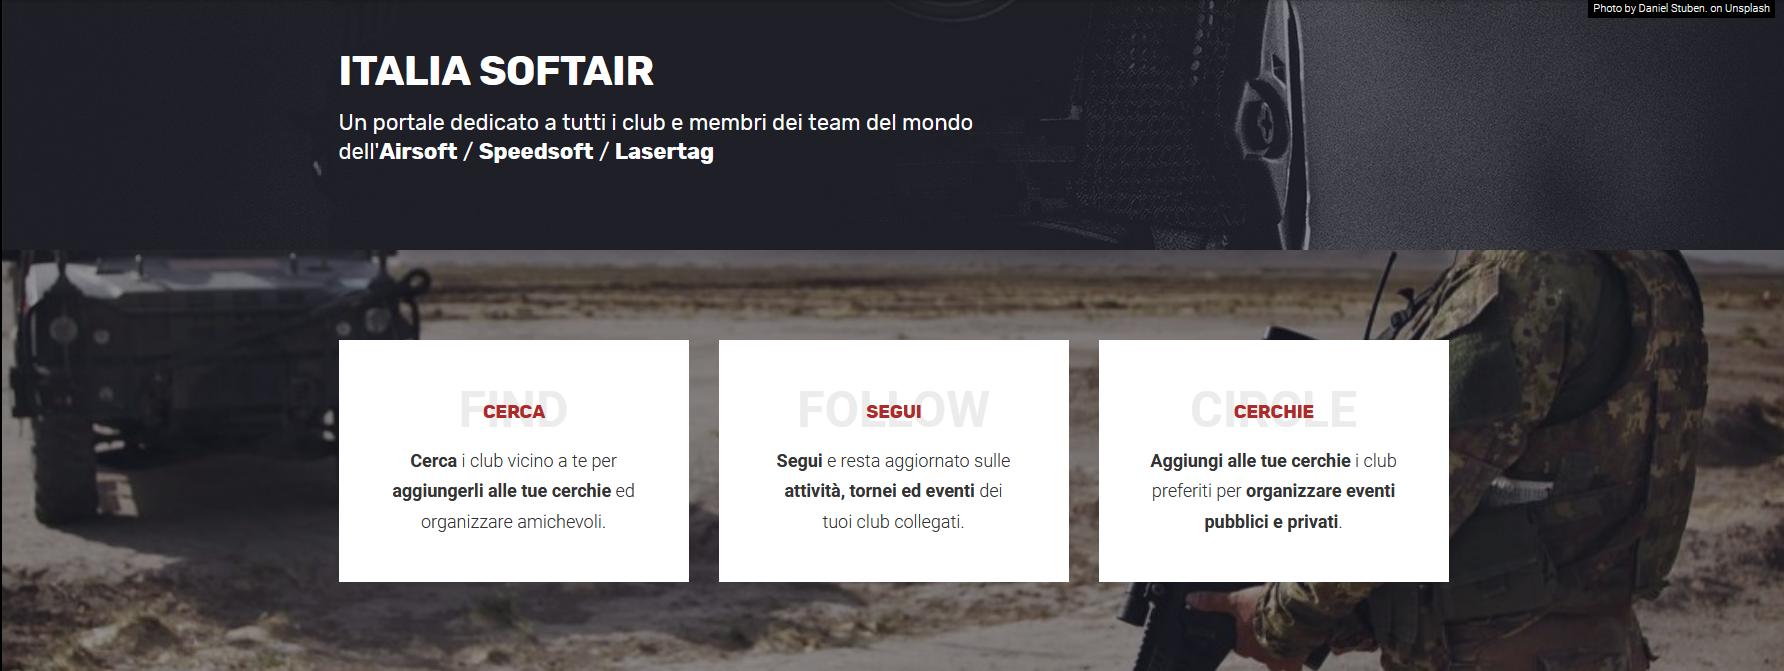 ItaliaSoftair.it - il softair passa per pisa